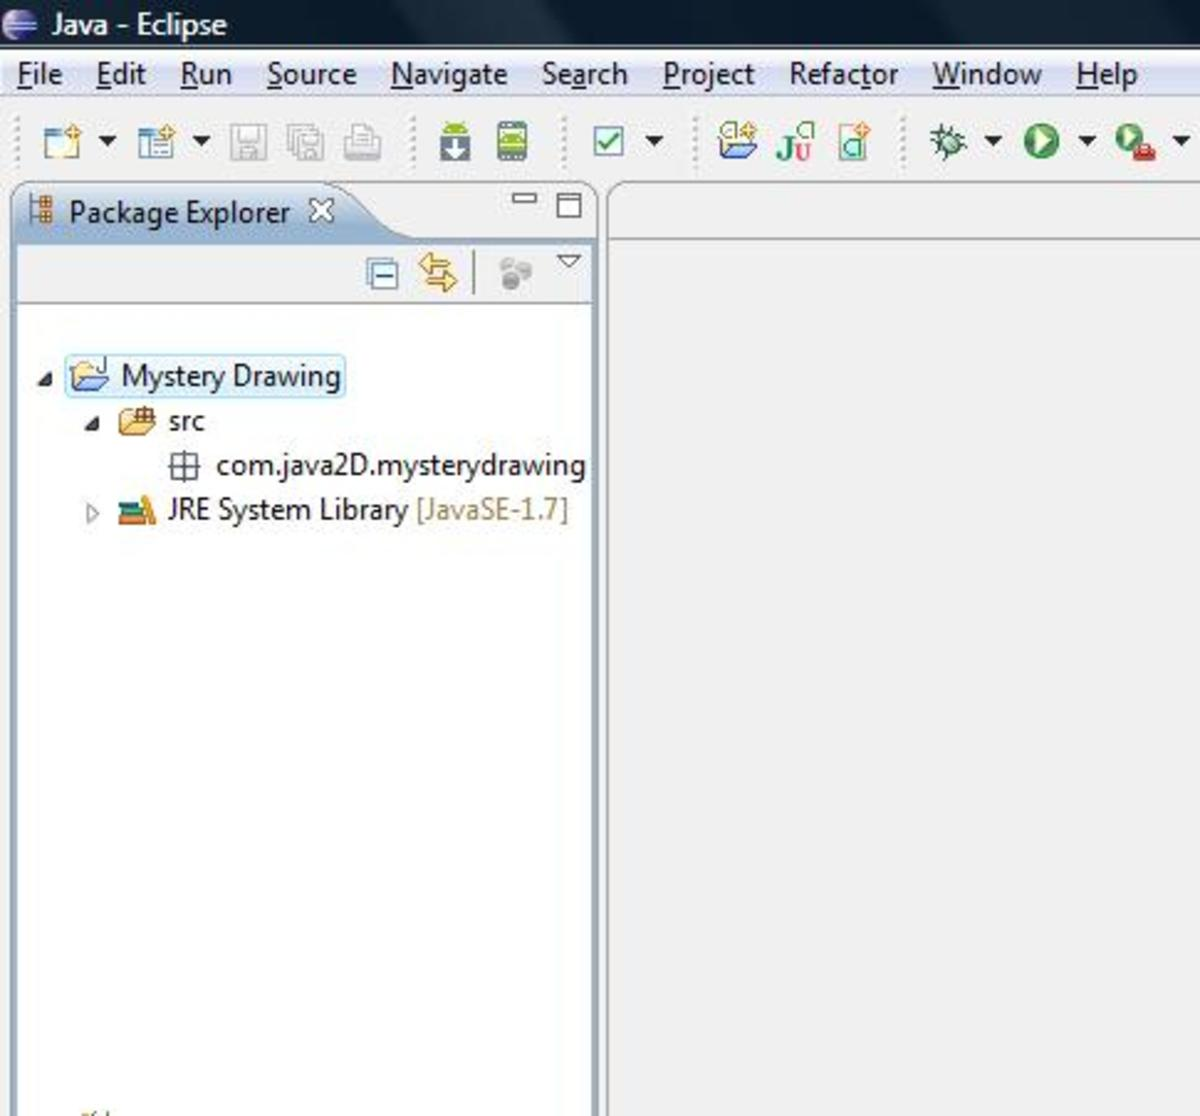 Screenshot: Package Explorer